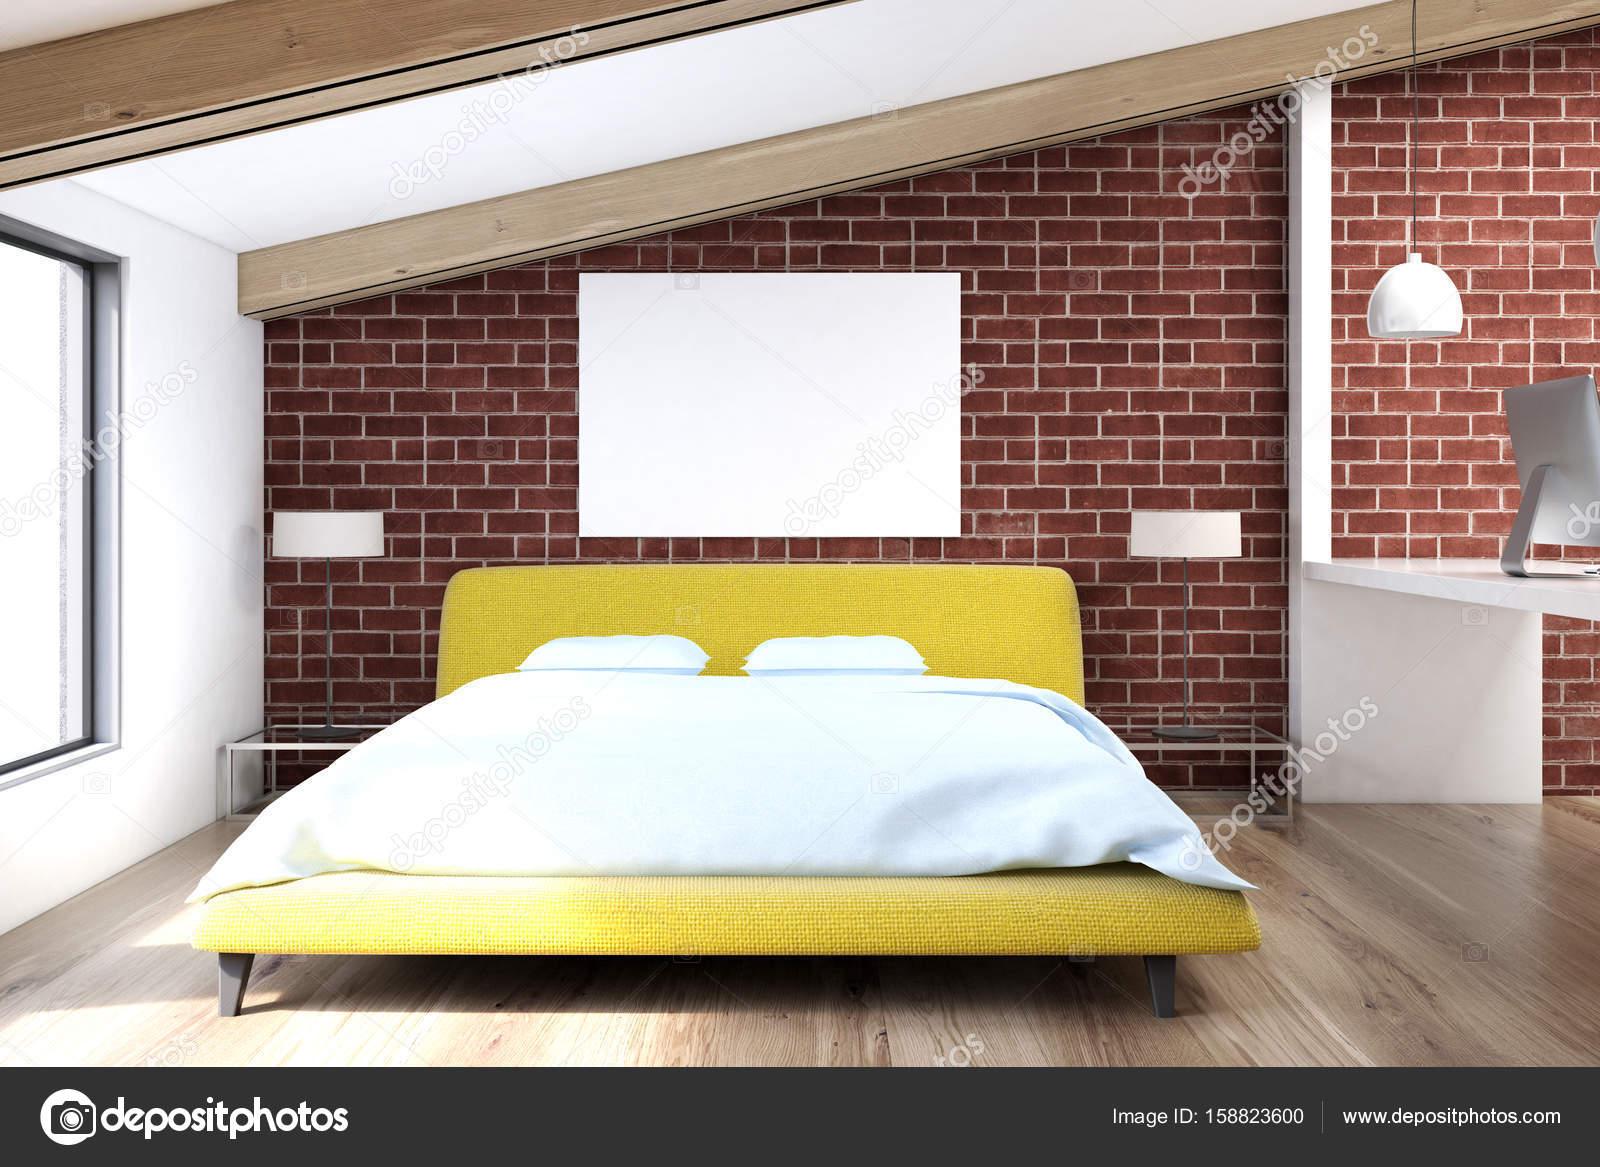 Slaapkamer Houten Vloer : Baksteen zolder slaapkamer houten vloer u2014 stockfoto